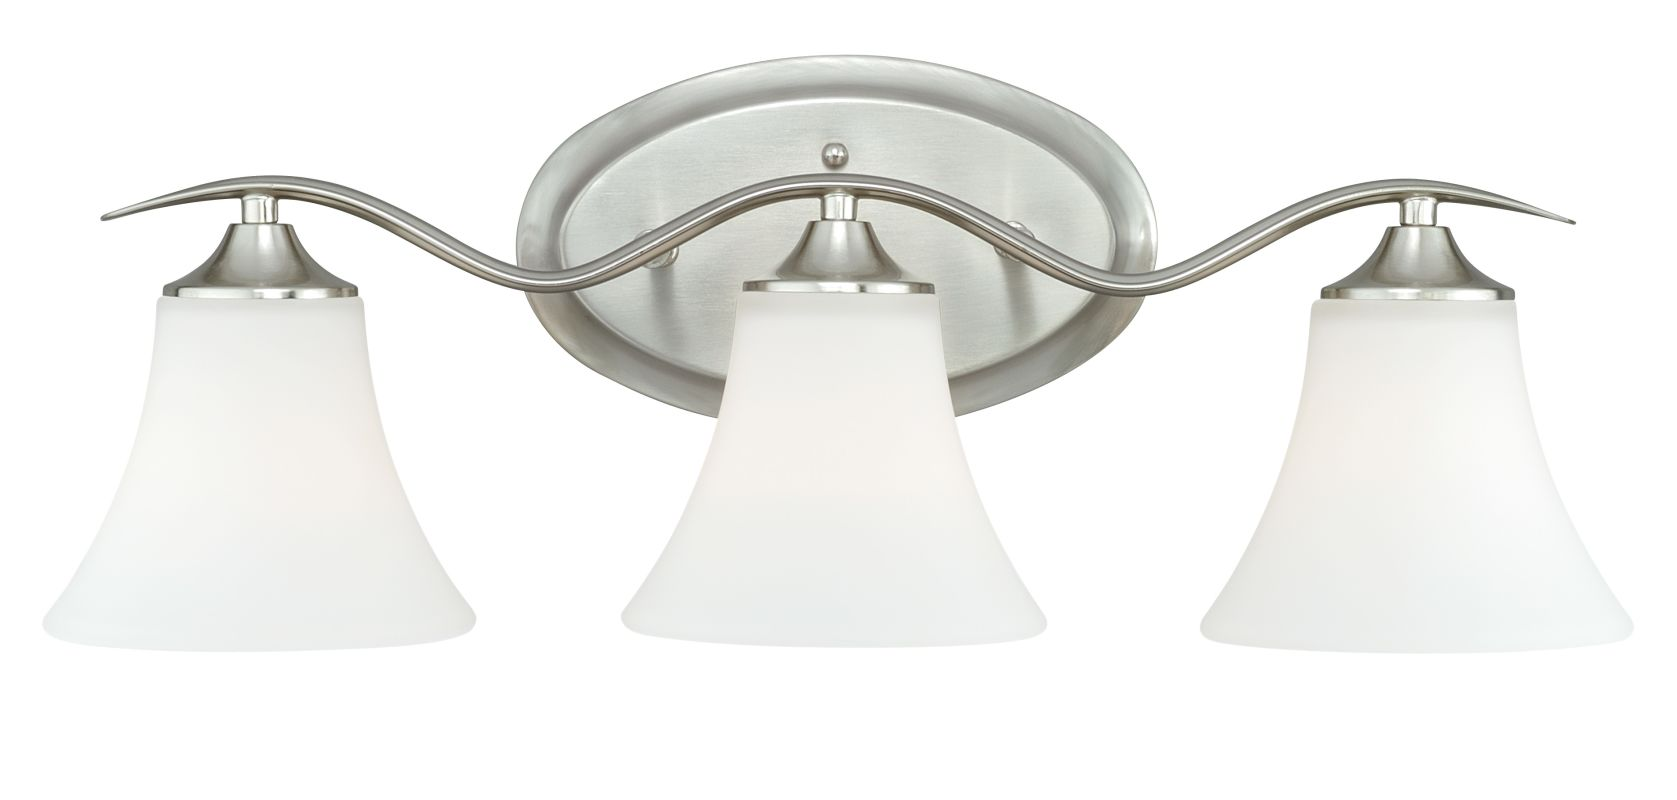 Vaxcel Lighting W0096 Cordoba 3 Light Bathroom Vanity Light - 22.5